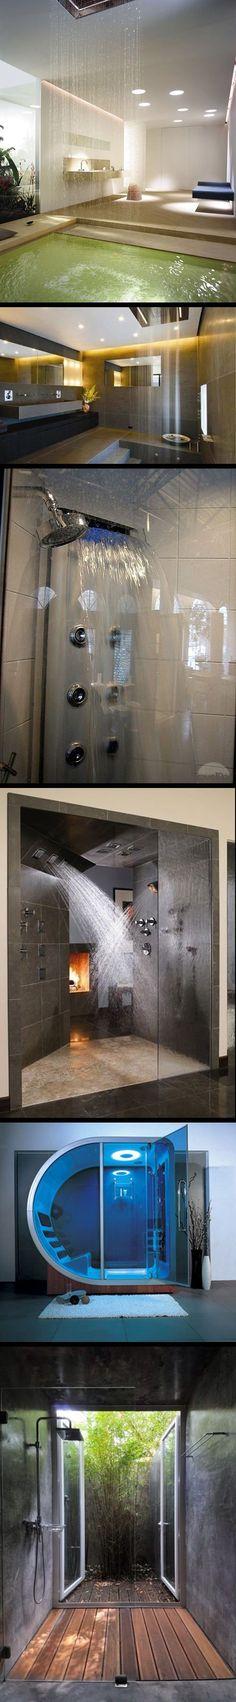 Cool and original shower designs...